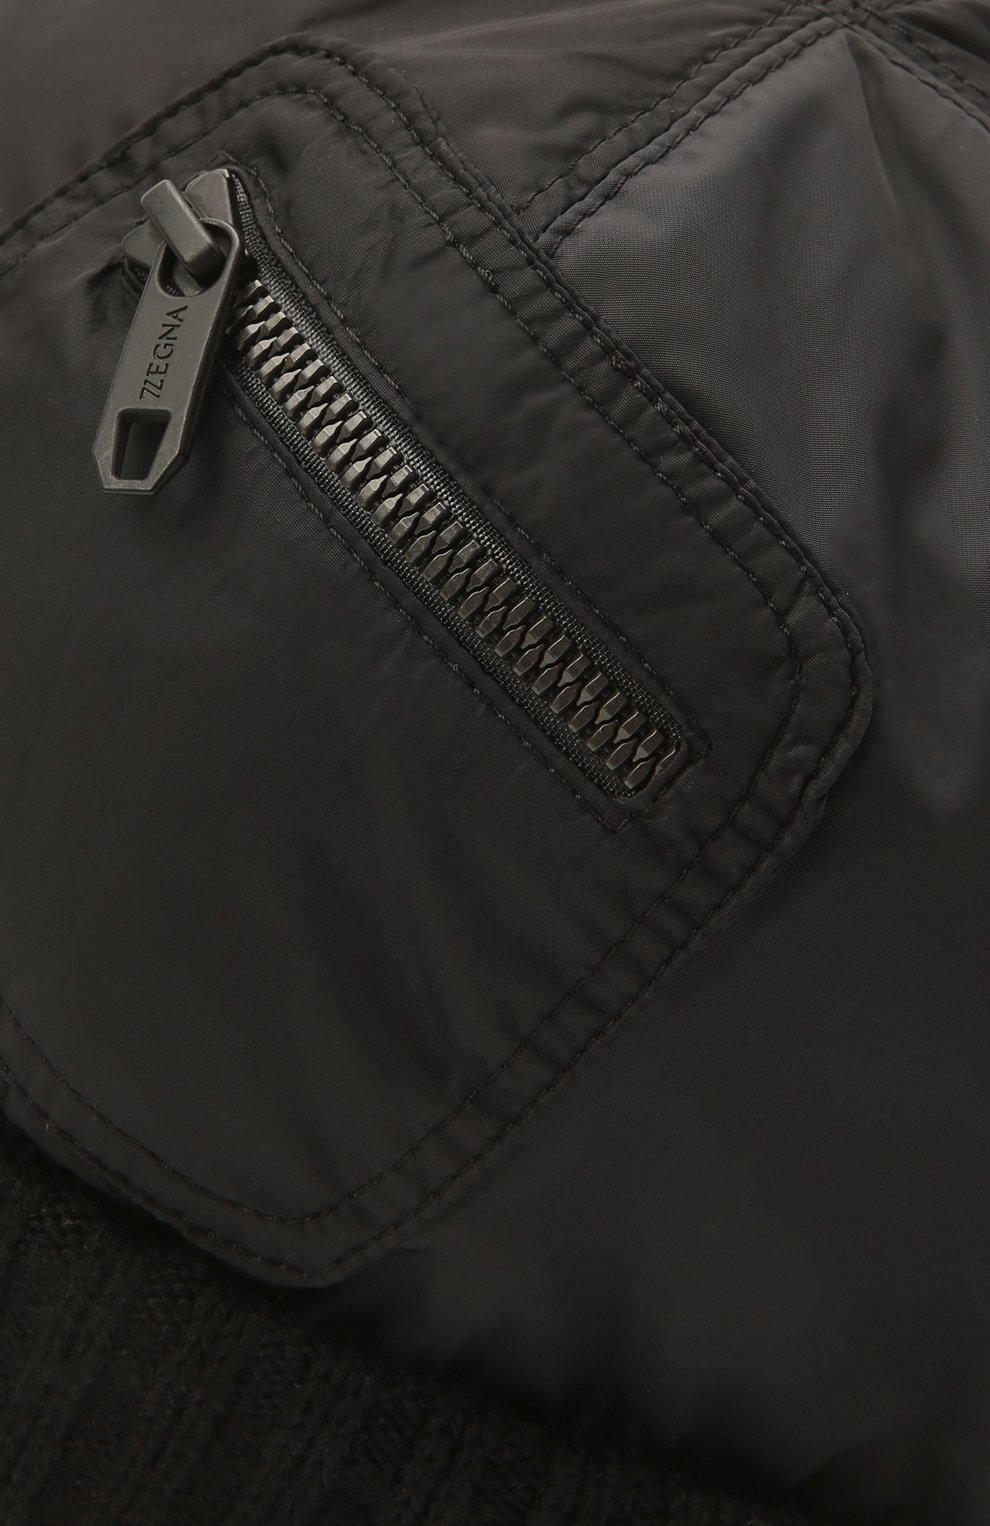 Мужская утепленная шапка Z ZEGNA черного цвета, арт. Z2I74H/B2W | Фото 3 (Материал: Текстиль; Кросс-КТ: Трикотаж)